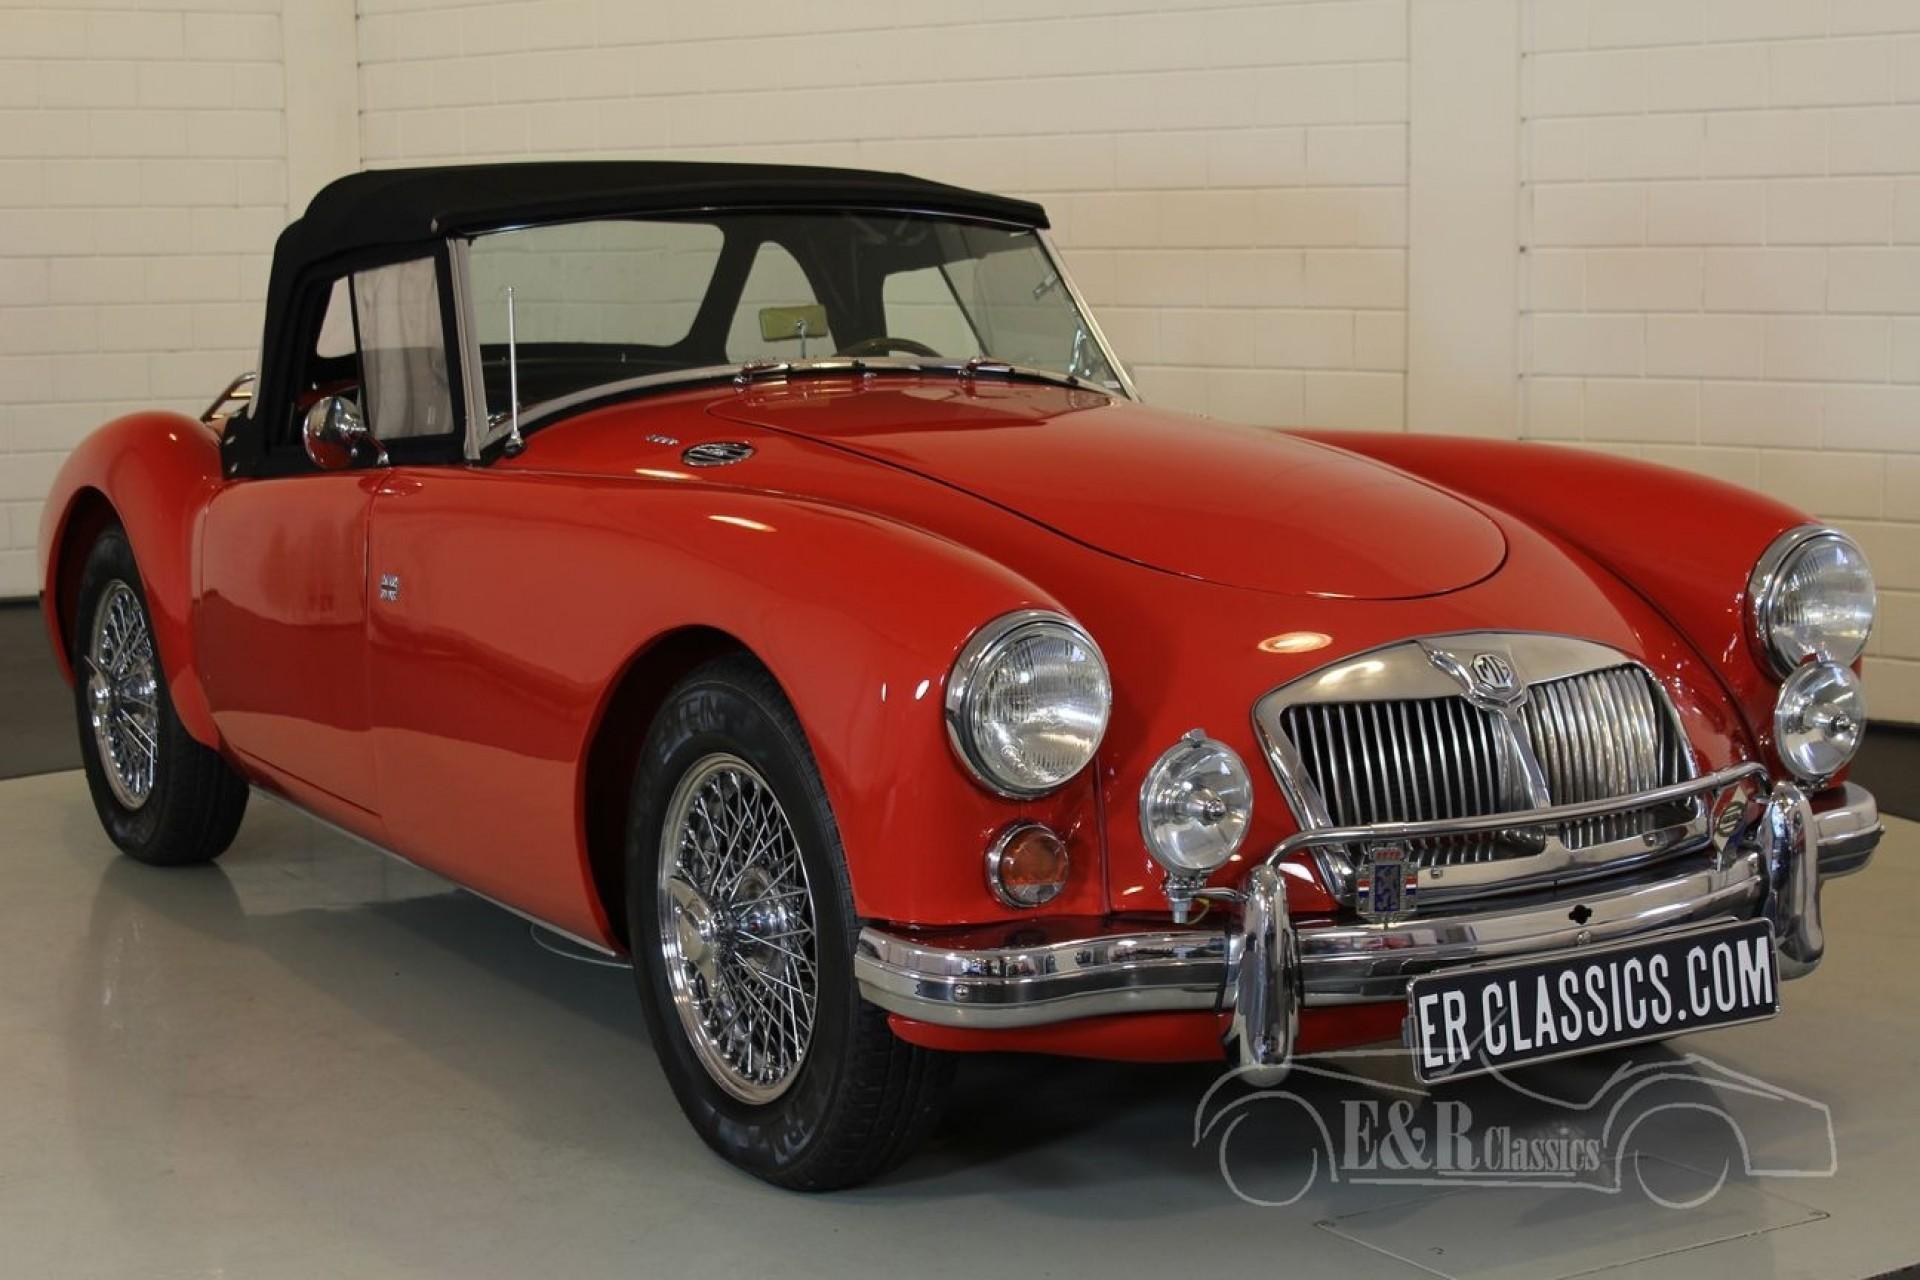 mga voiture mg mga d 39 occasion de 1958 1 000 km 21 500 voiture mg mga occasion de 1958 pour. Black Bedroom Furniture Sets. Home Design Ideas